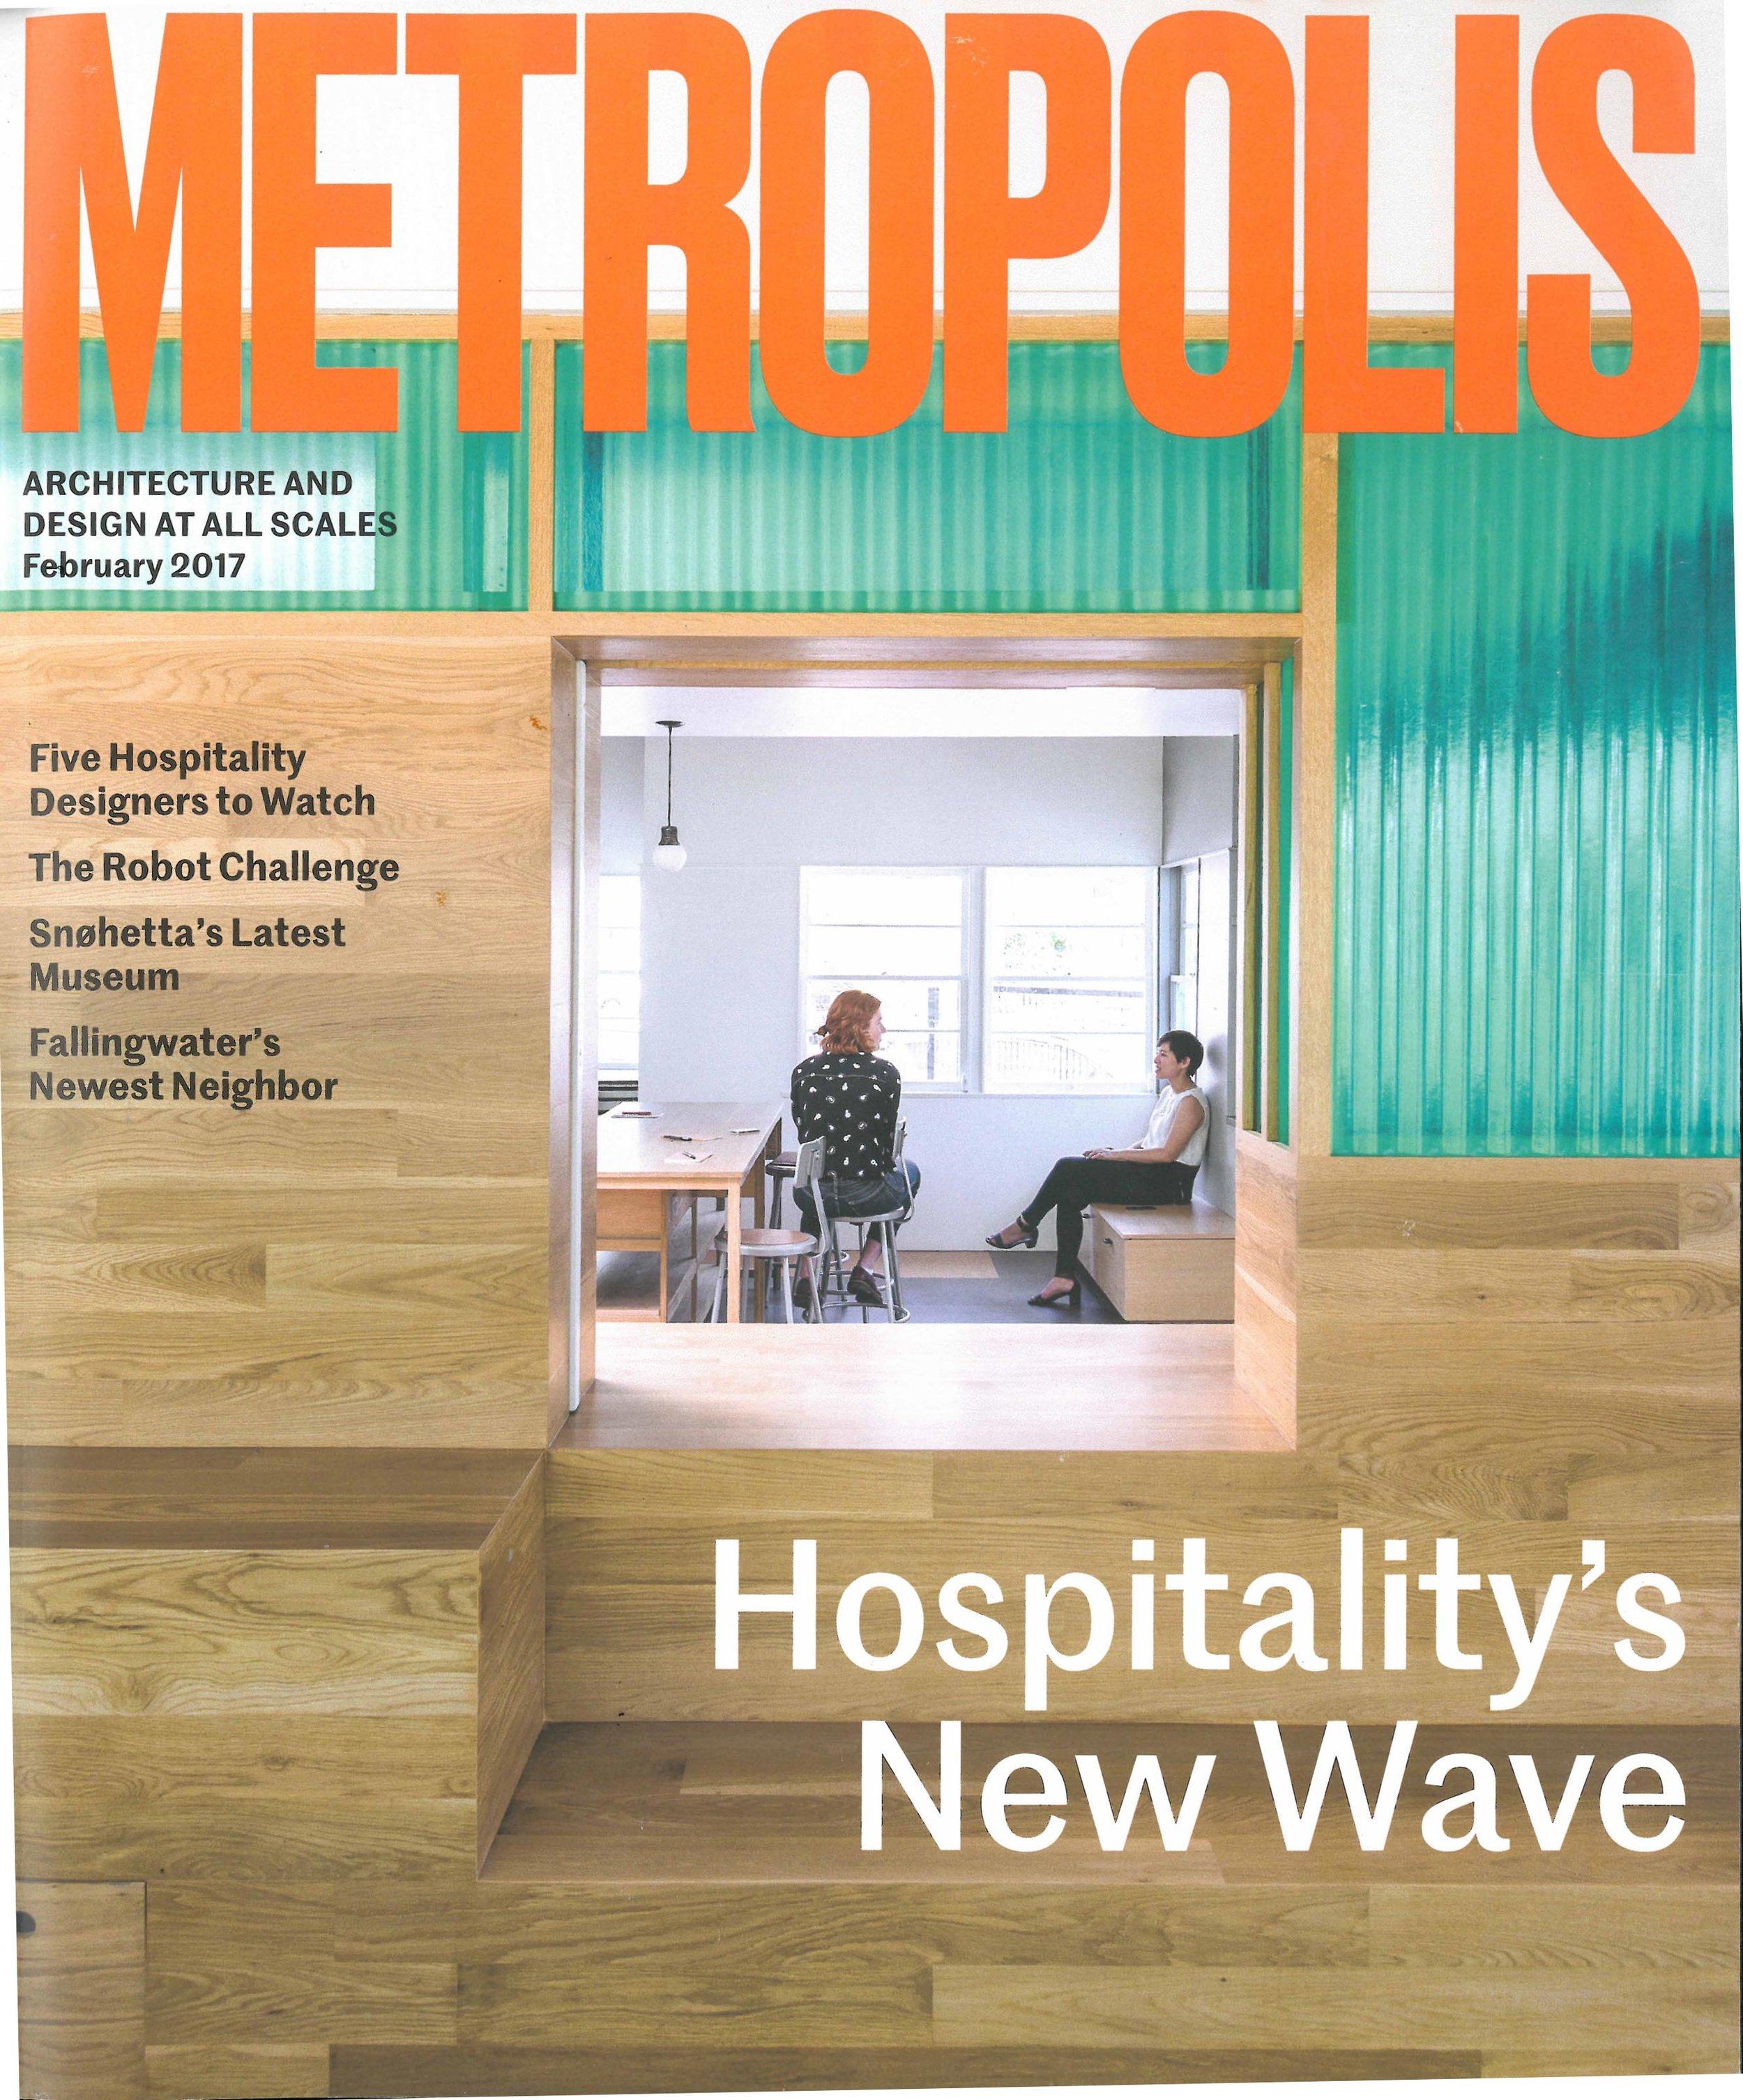 Metropolis Think Tank: Metropolis X Shulman+Associates. Metropolis: Architecture and design at all scales, February 2017      MORE >>